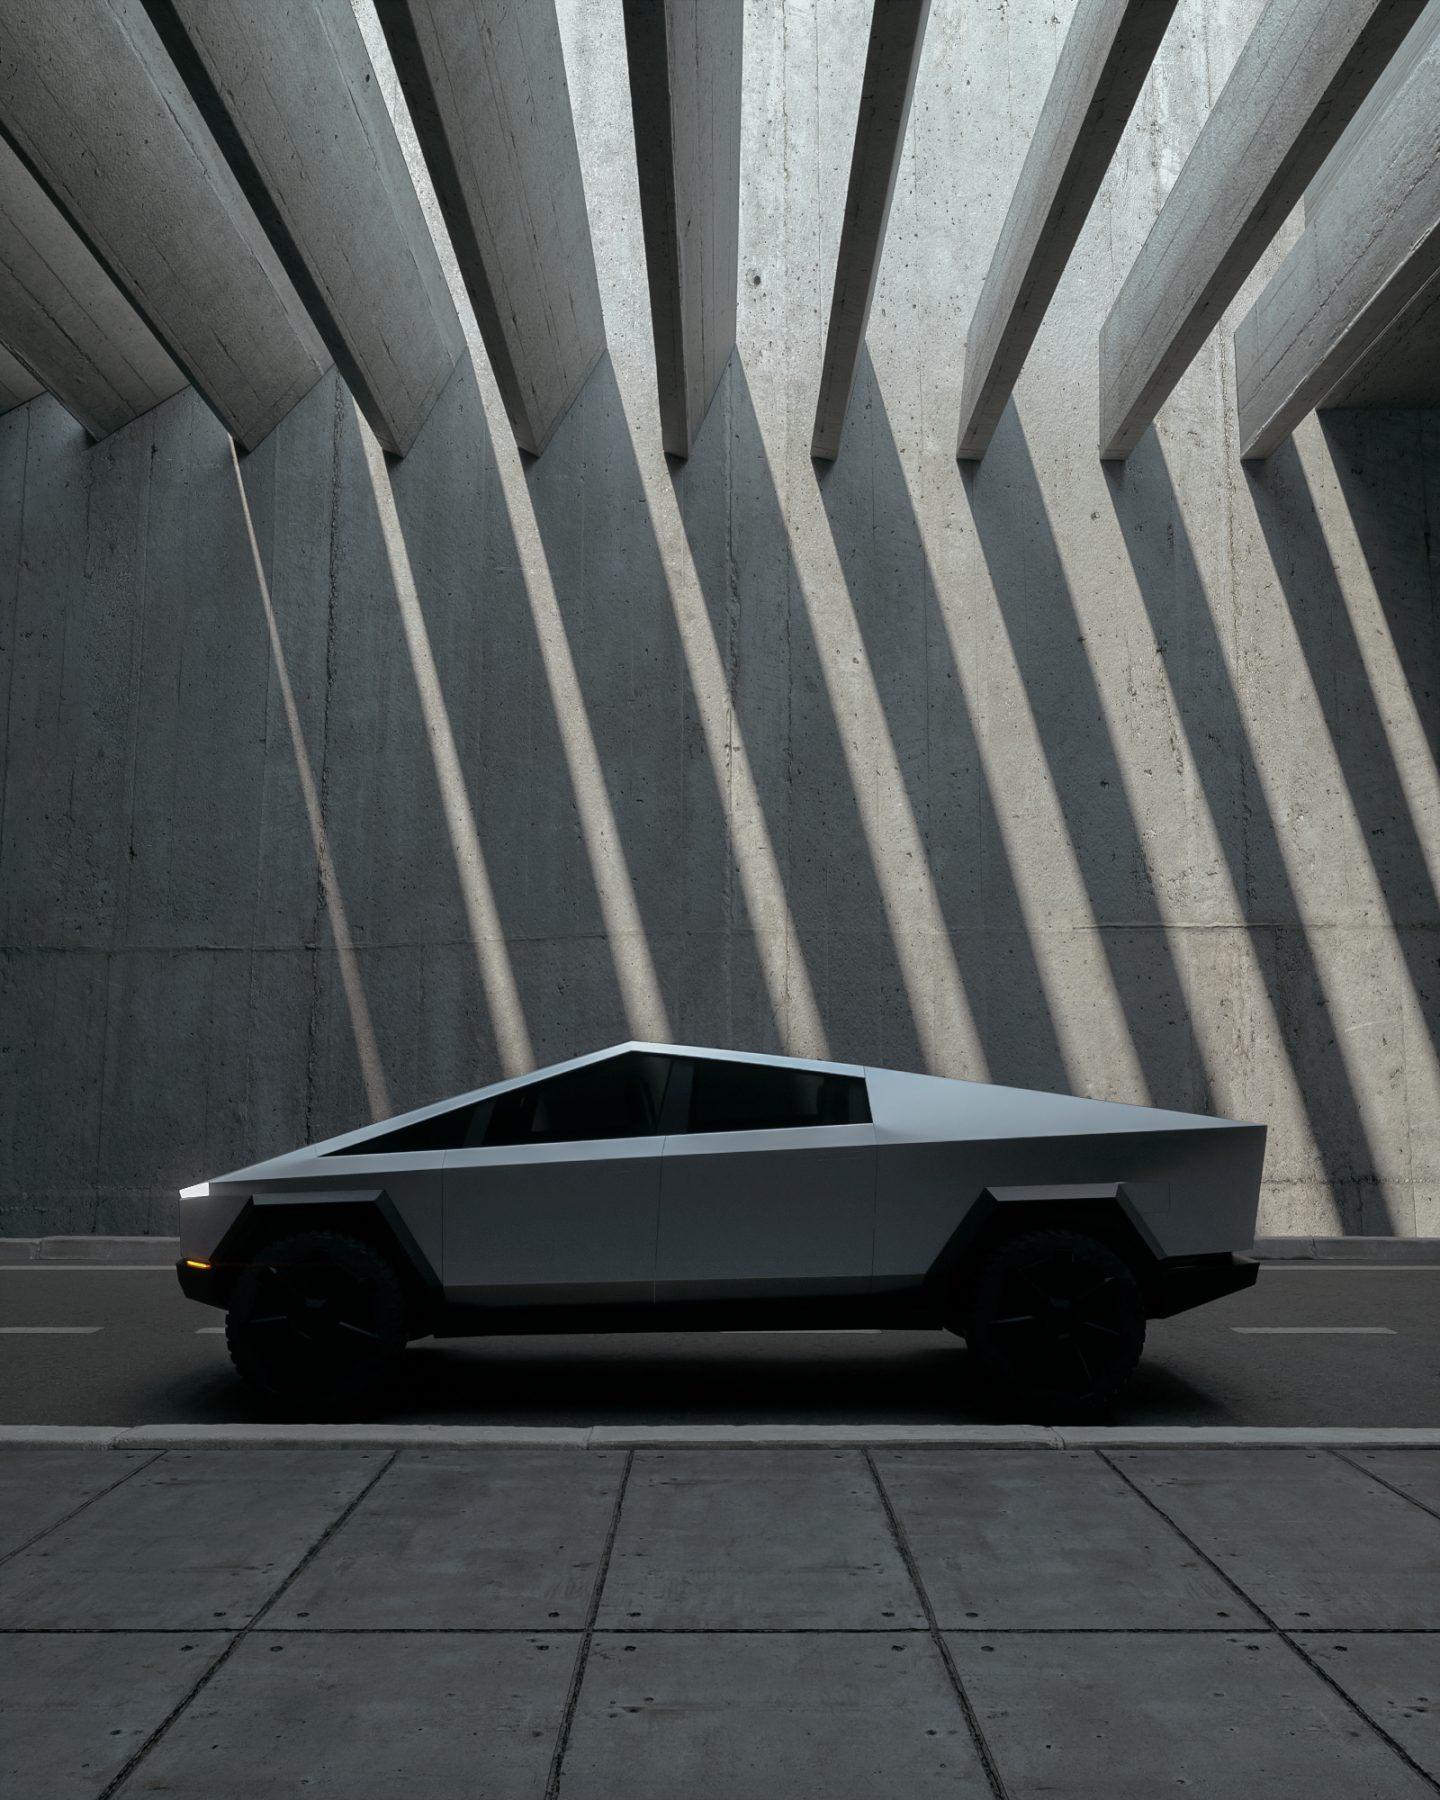 IGNANT-Tesla-cybertruck-cgi-brutalism-cgi-editorial-5